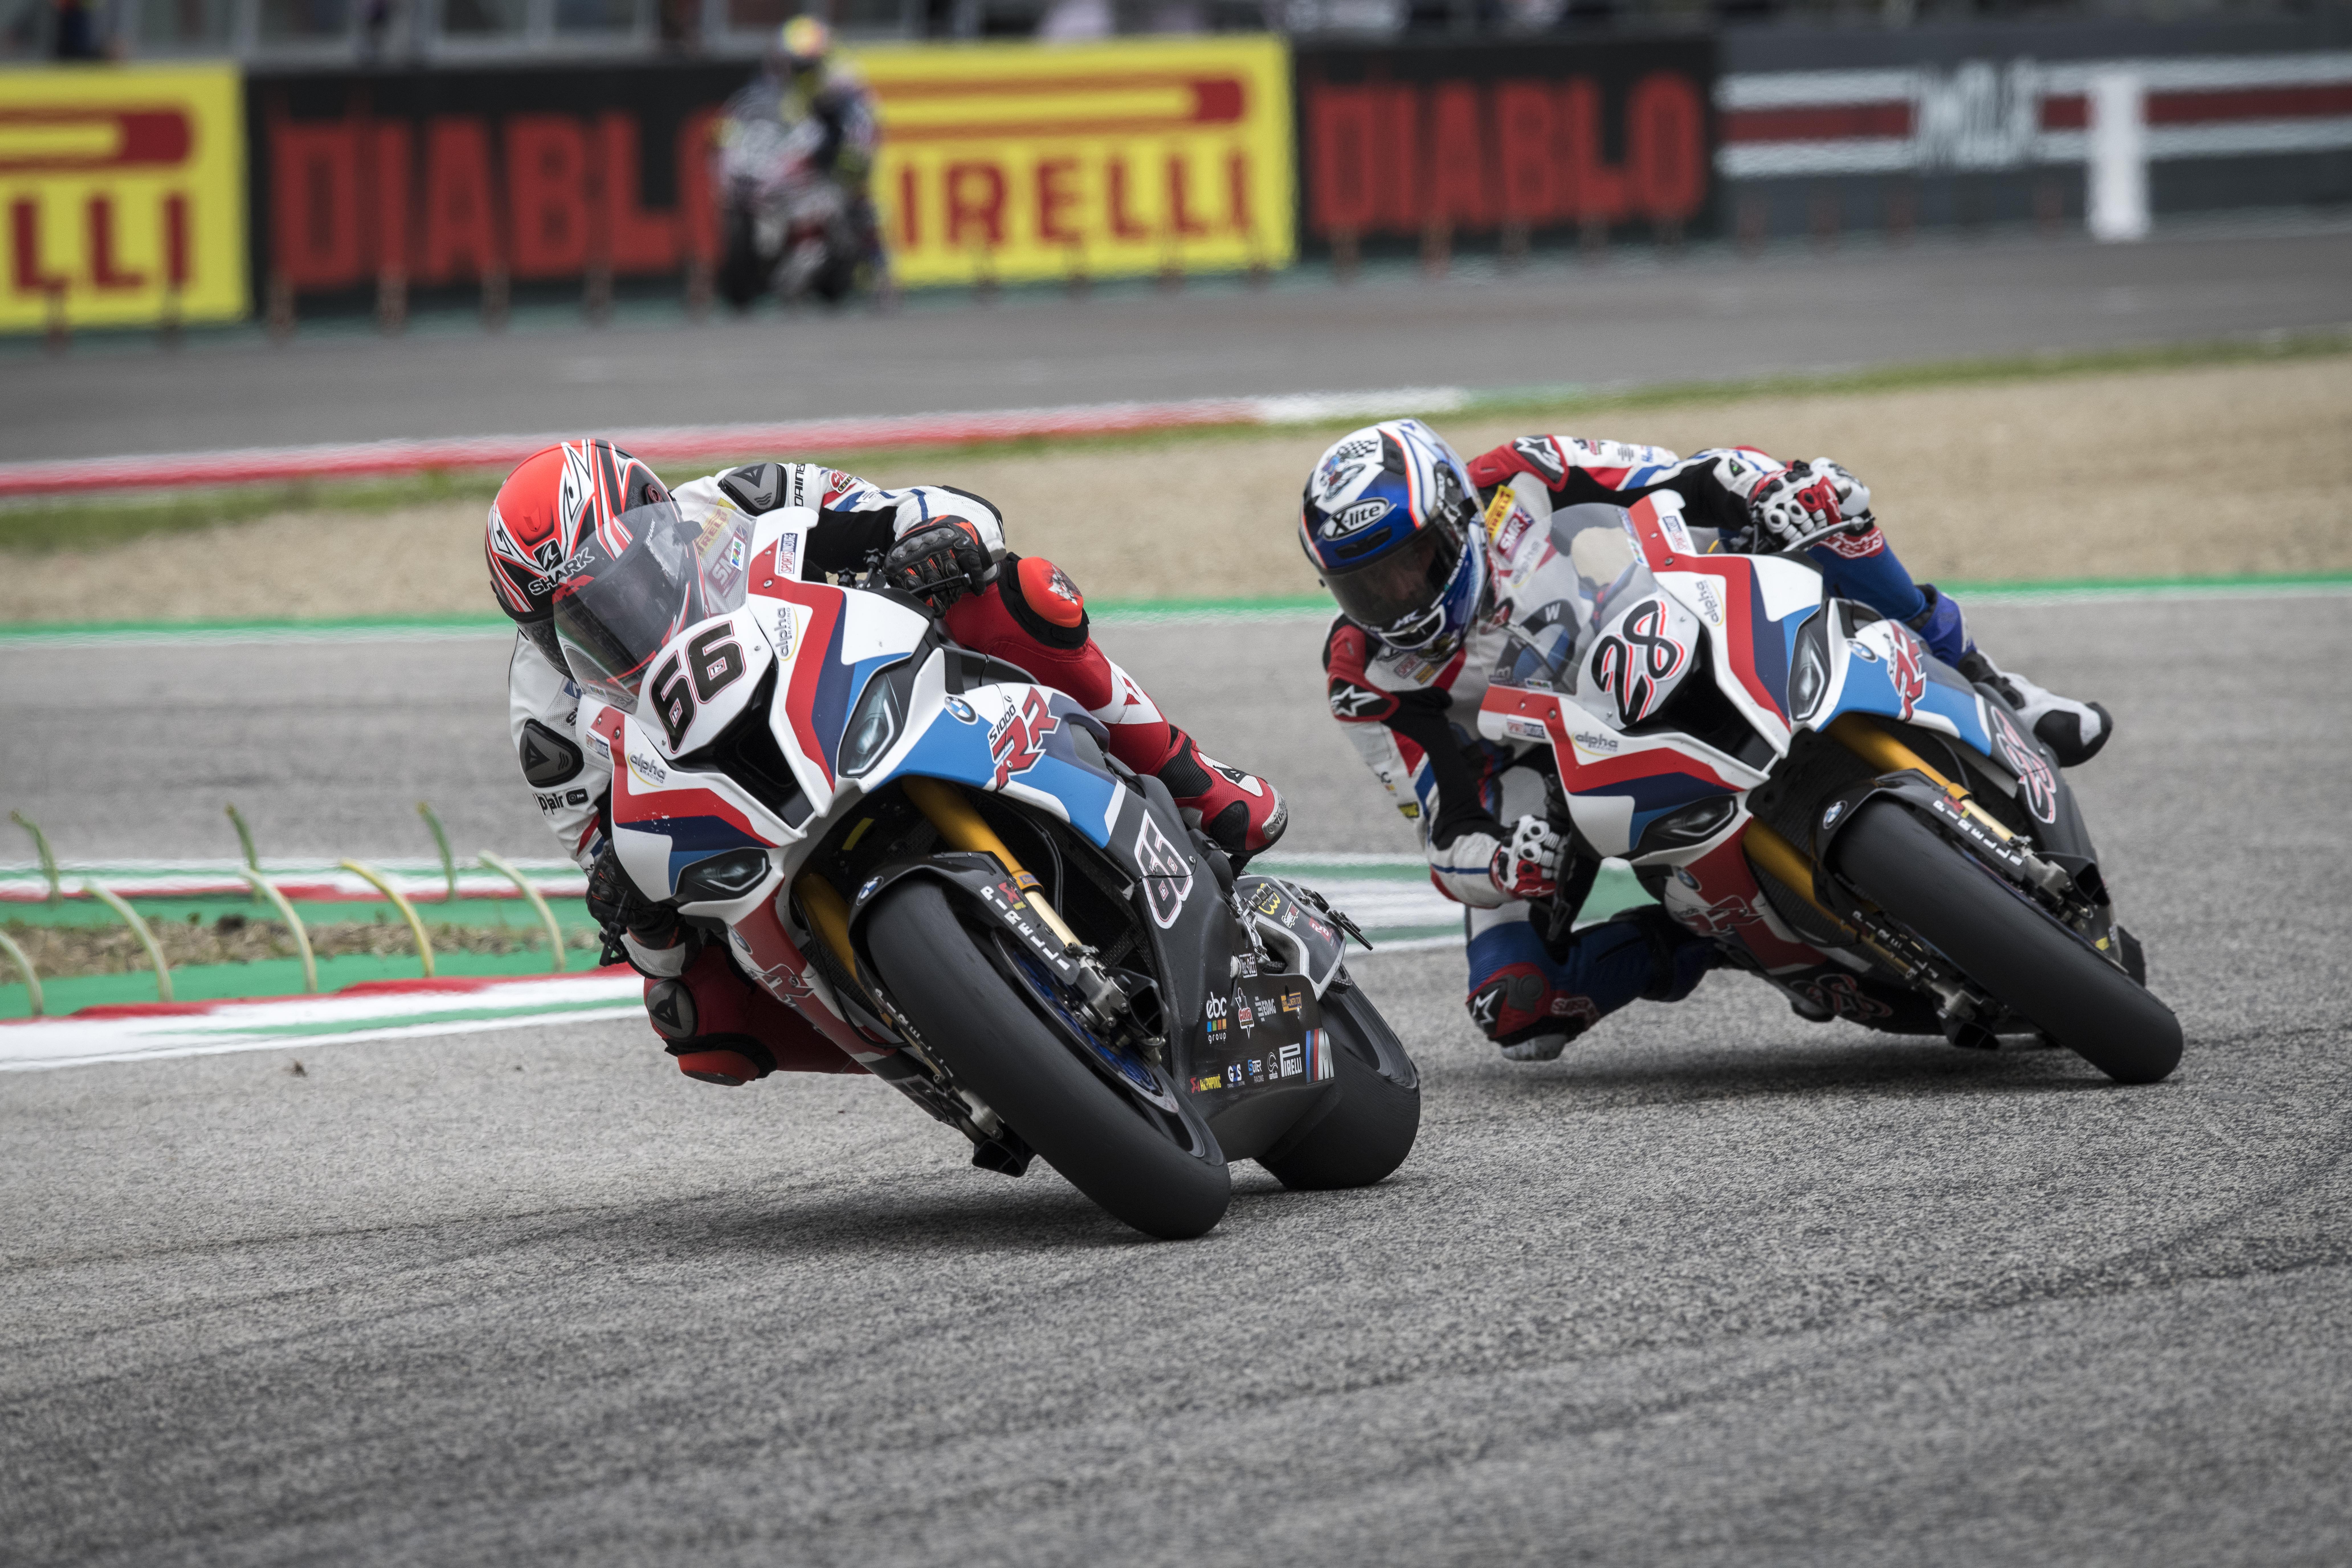 SBK- Race cancelled due to rain; BMW Motorrad impressive run cut short